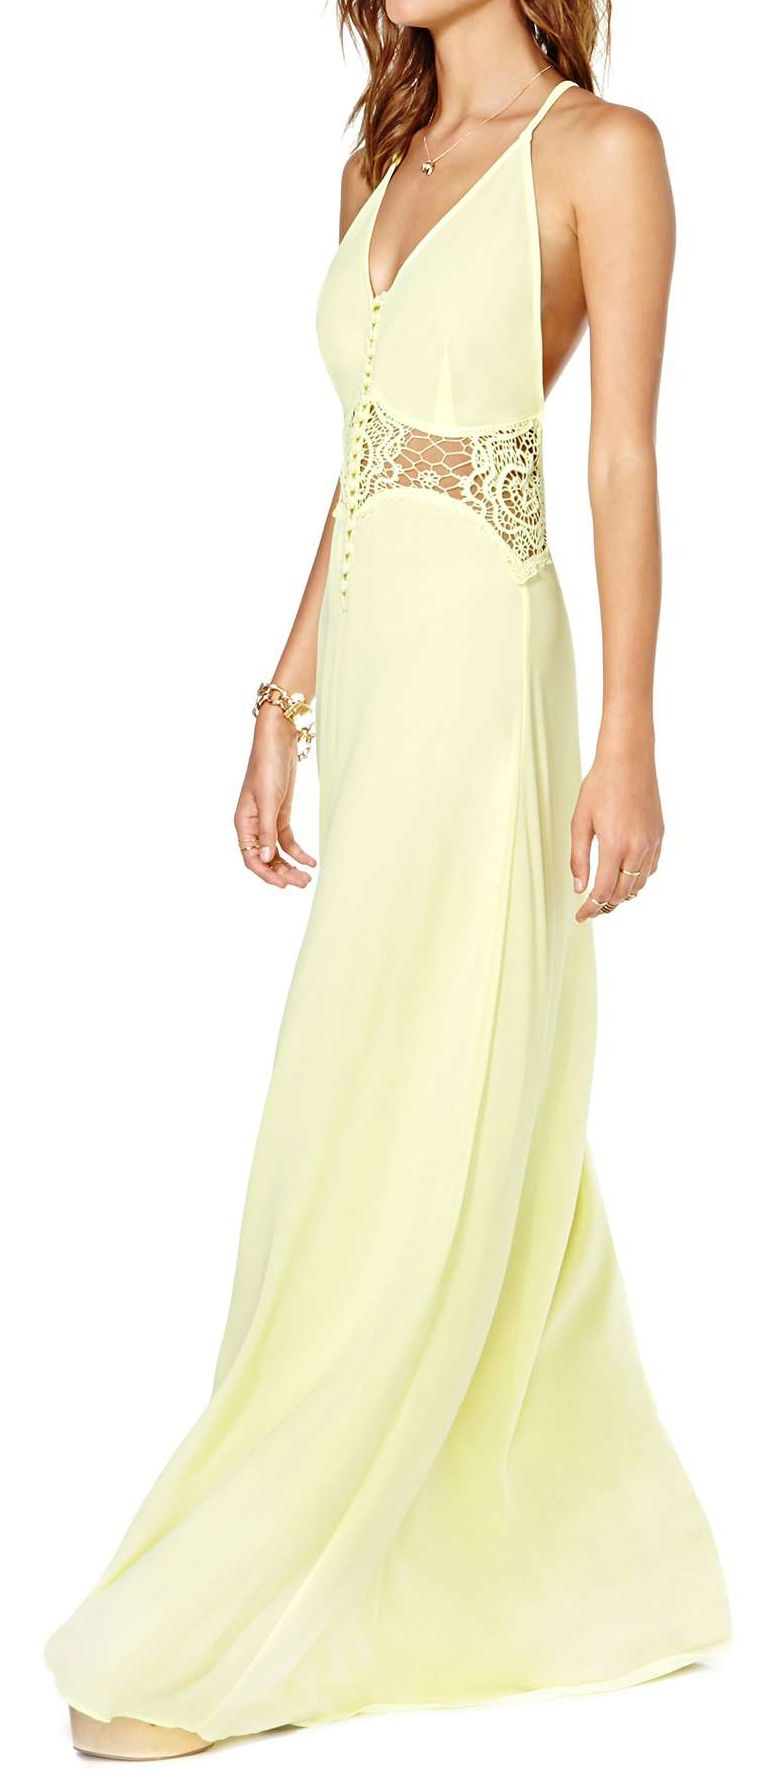 Citron lace maxi the bride pinterest lace maxi clothes and gowns